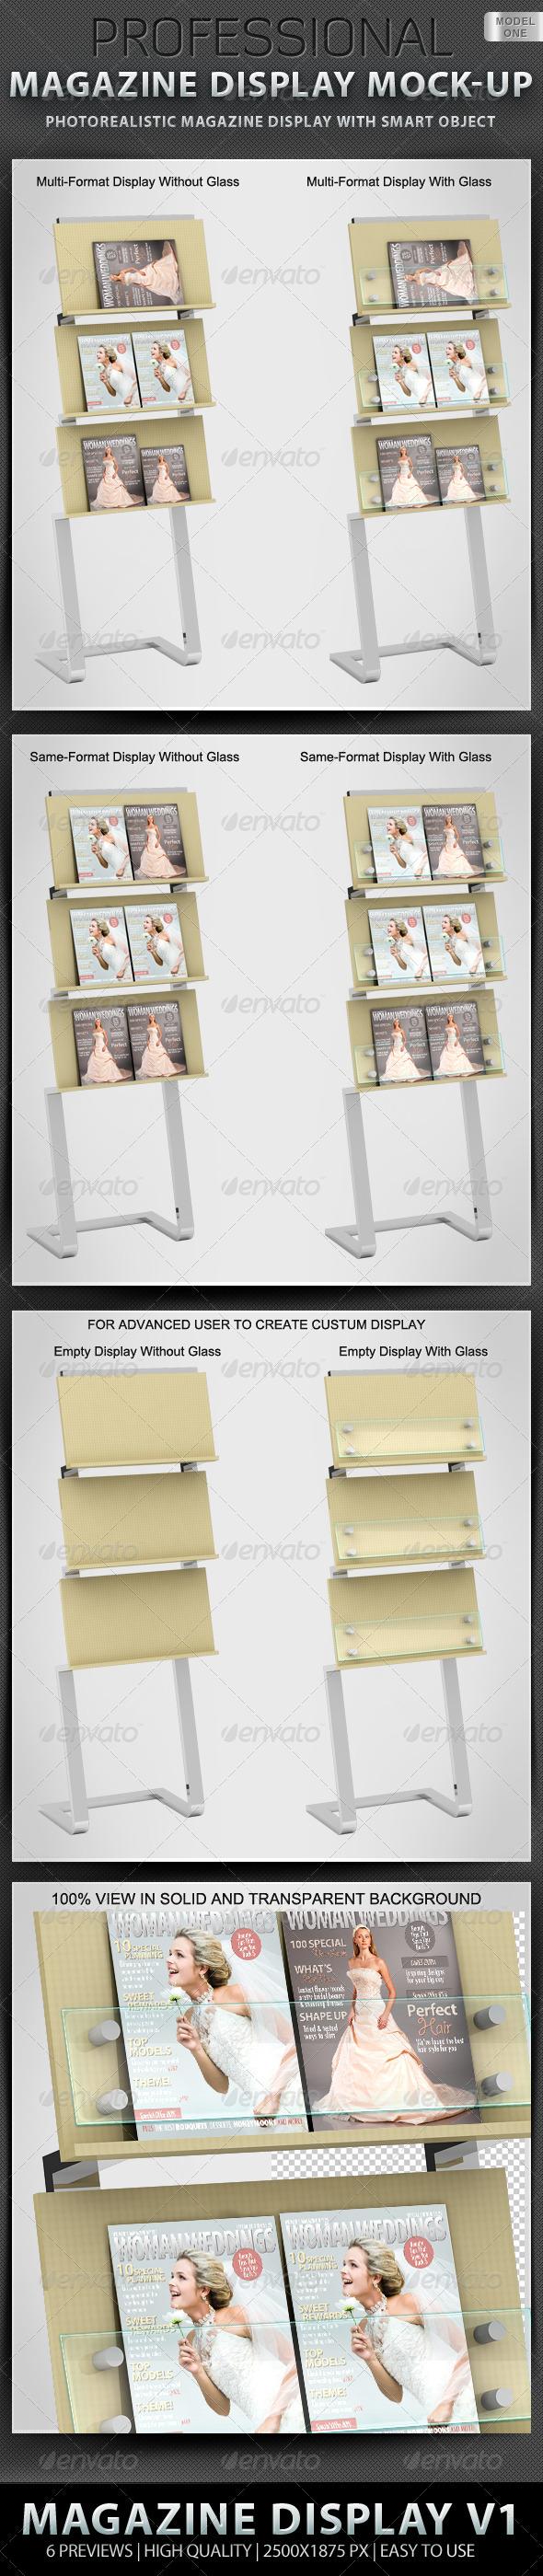 GraphicRiver Professional Magazine Display Mock-up V1 1398733